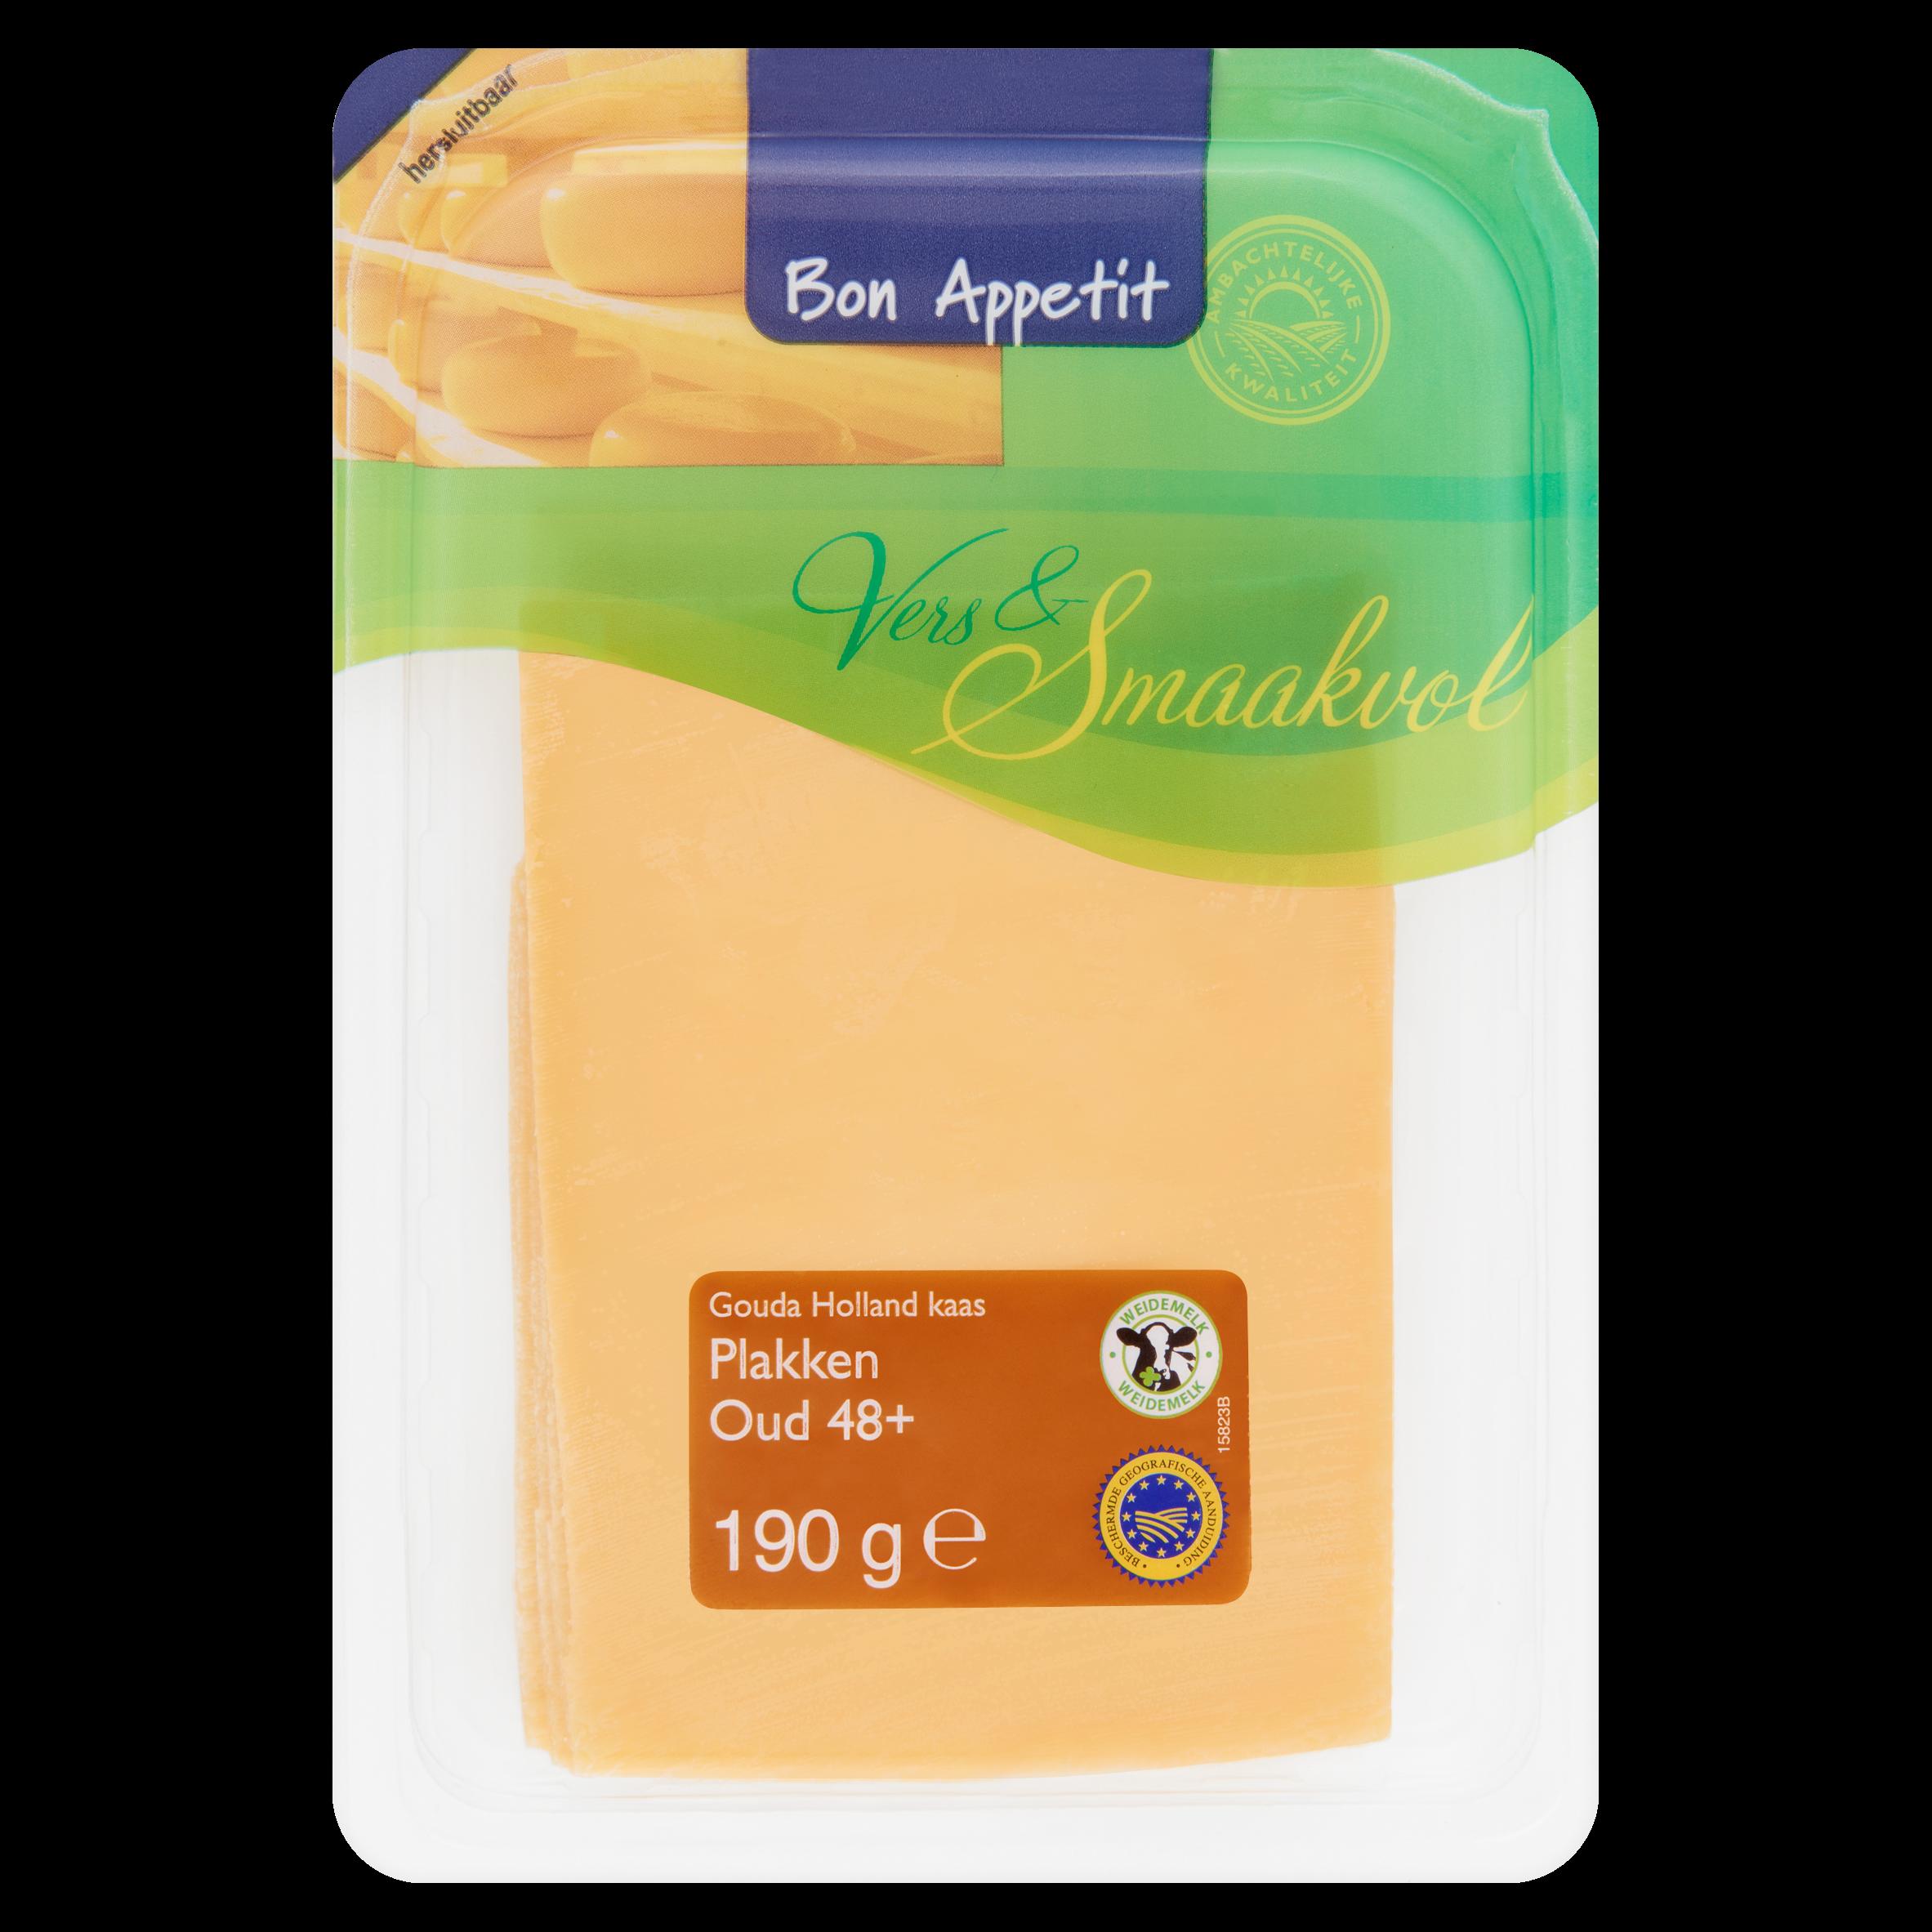 Bon Appetit Gouda Holland Kaas Oud 48+ Plakken 190 g